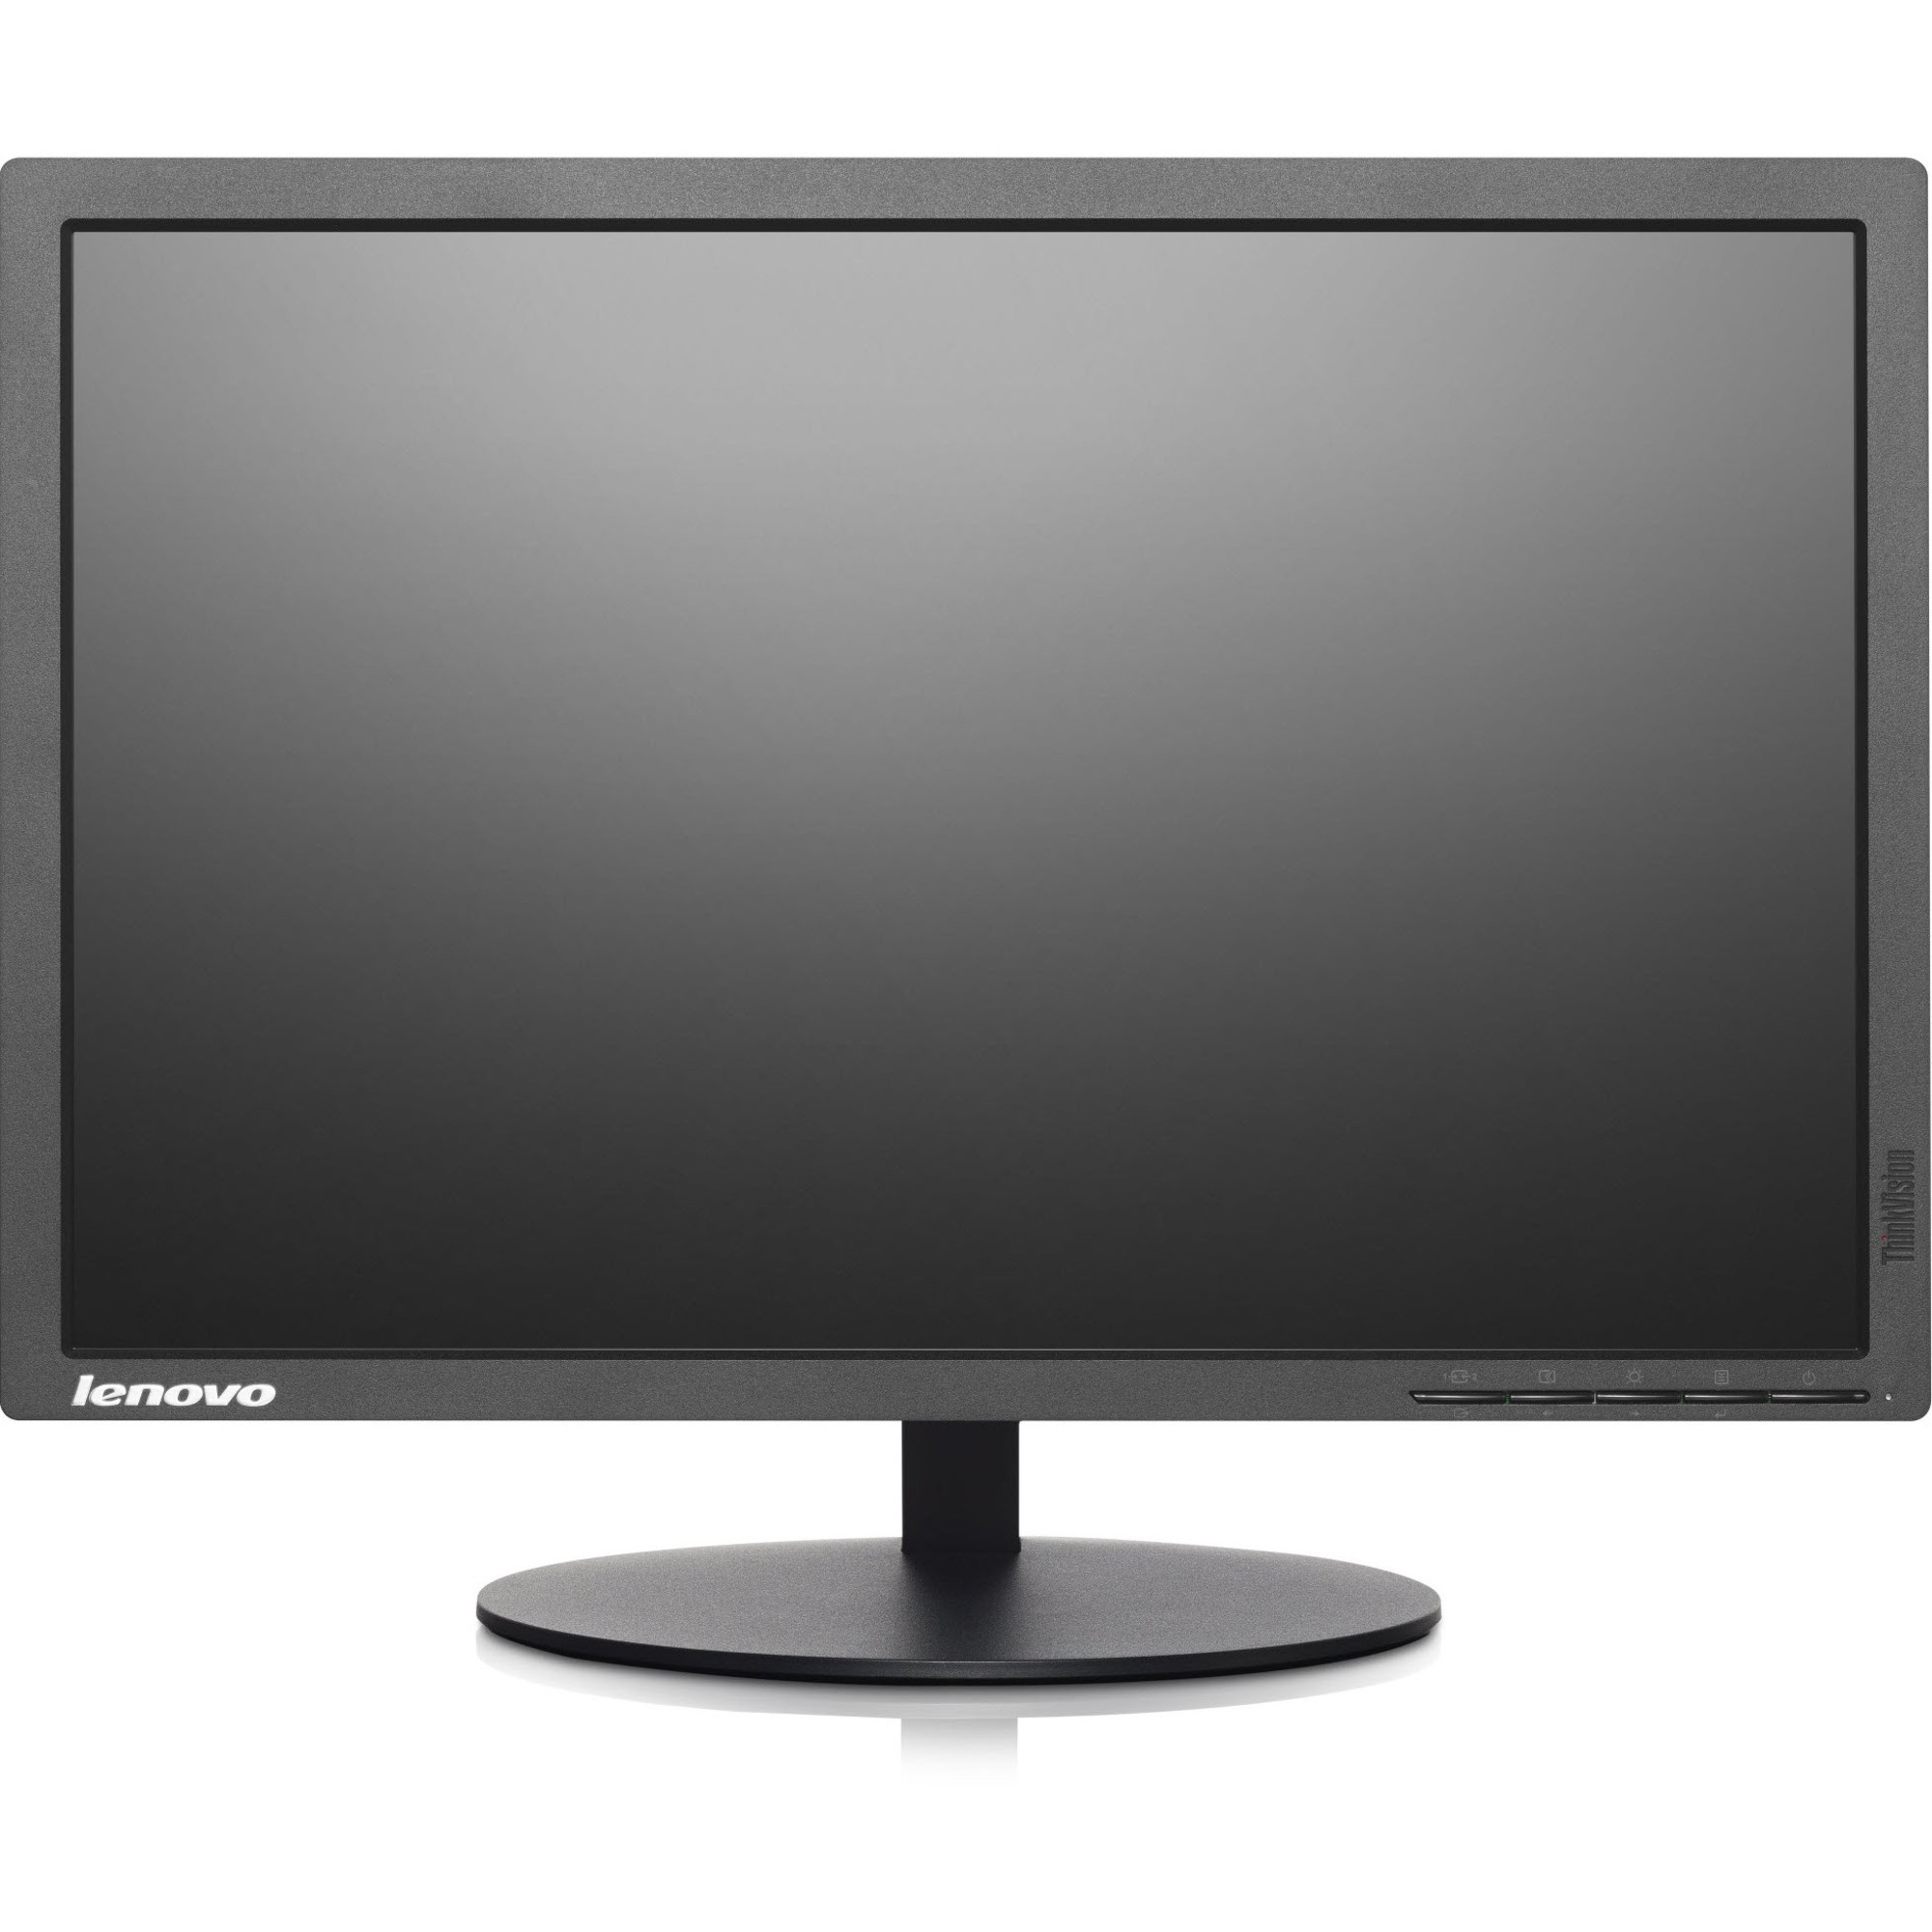 "Lenovo ThinkVision T2054p 19.5"" WXGA+ LED LCD Monitor - 16:10 - Raven Black_subImage_1"